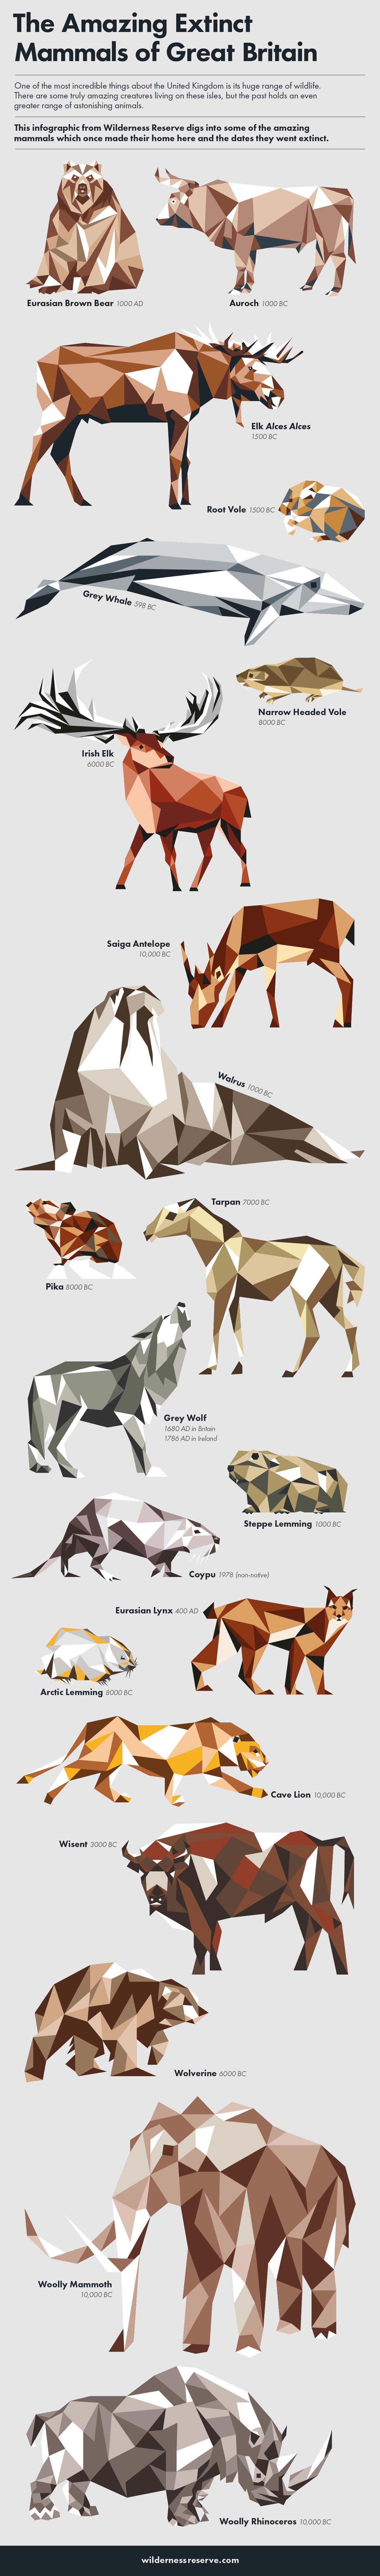 The extinct animals of great britain infographic